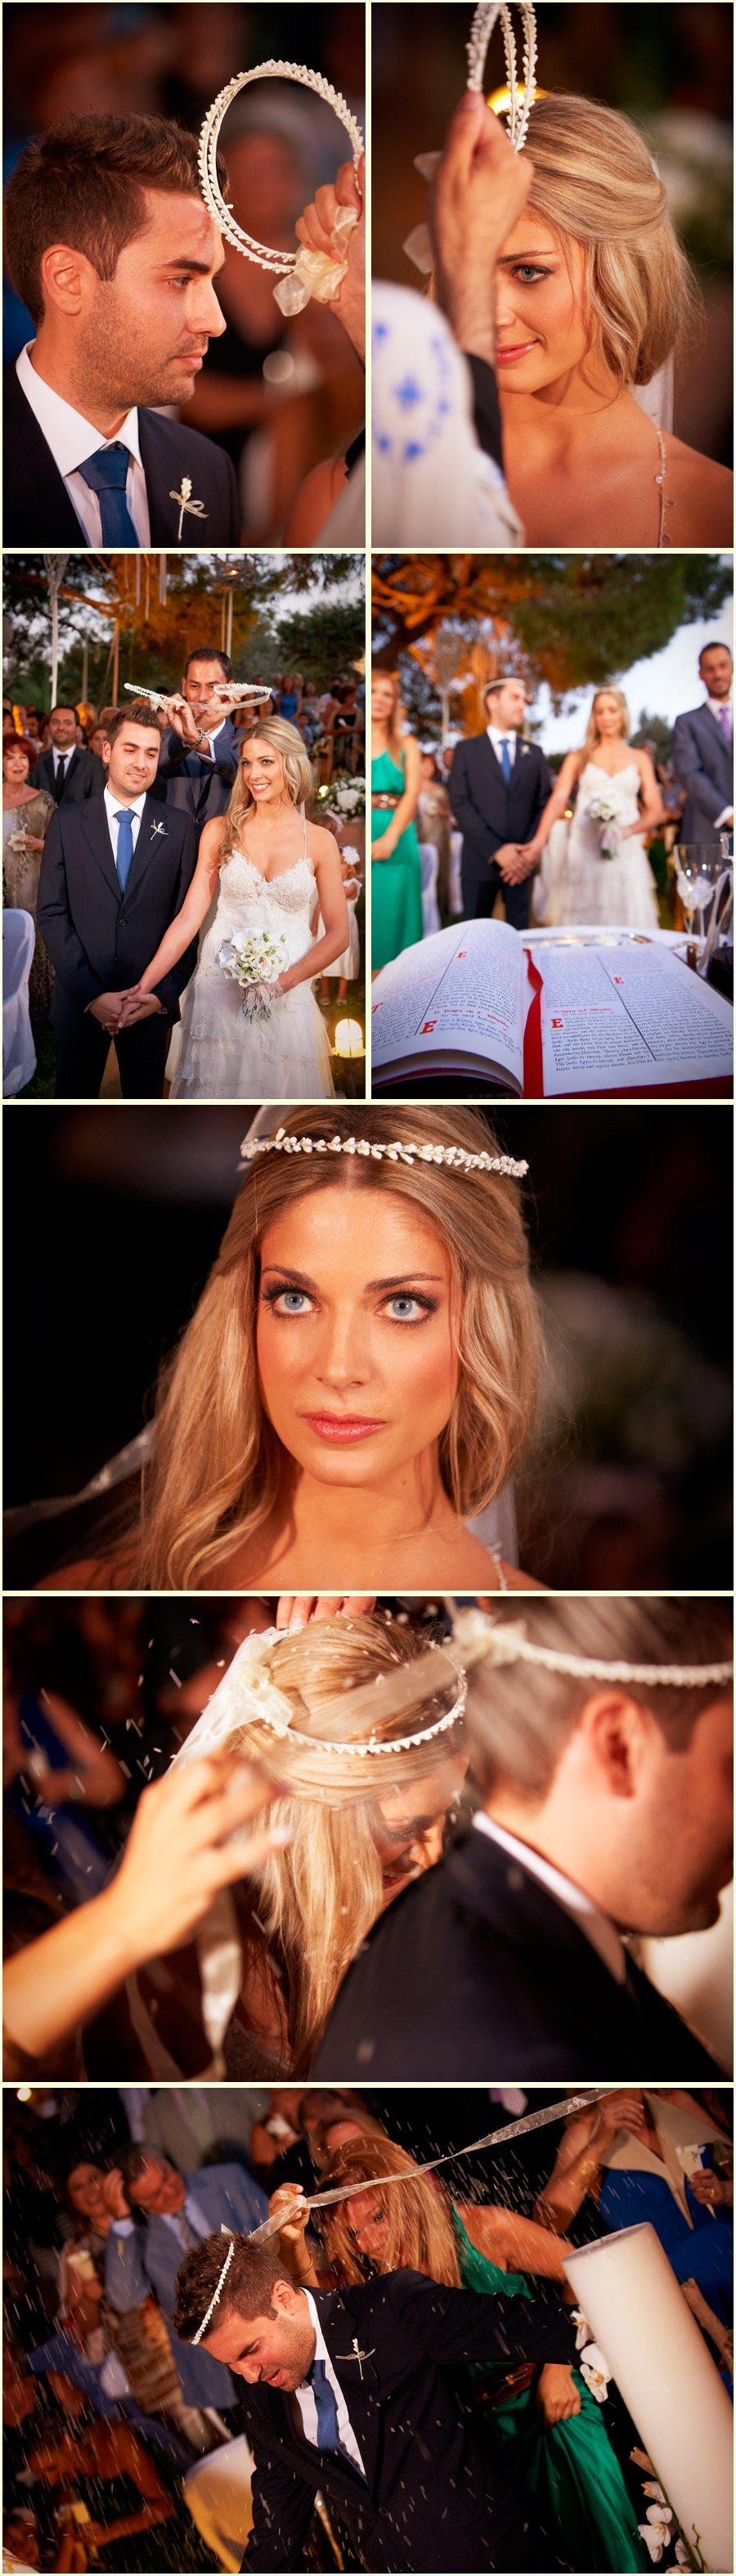 7bd5d3212394 Η πιο όμορφη νύφη που έχω συναντήσει και μιλάω για την απίστευτη εσωτερική  ομορφιά της Πένυ που διαχέεται προς τα έξω με τα μεγάλα εκφραστικά της μάτια .